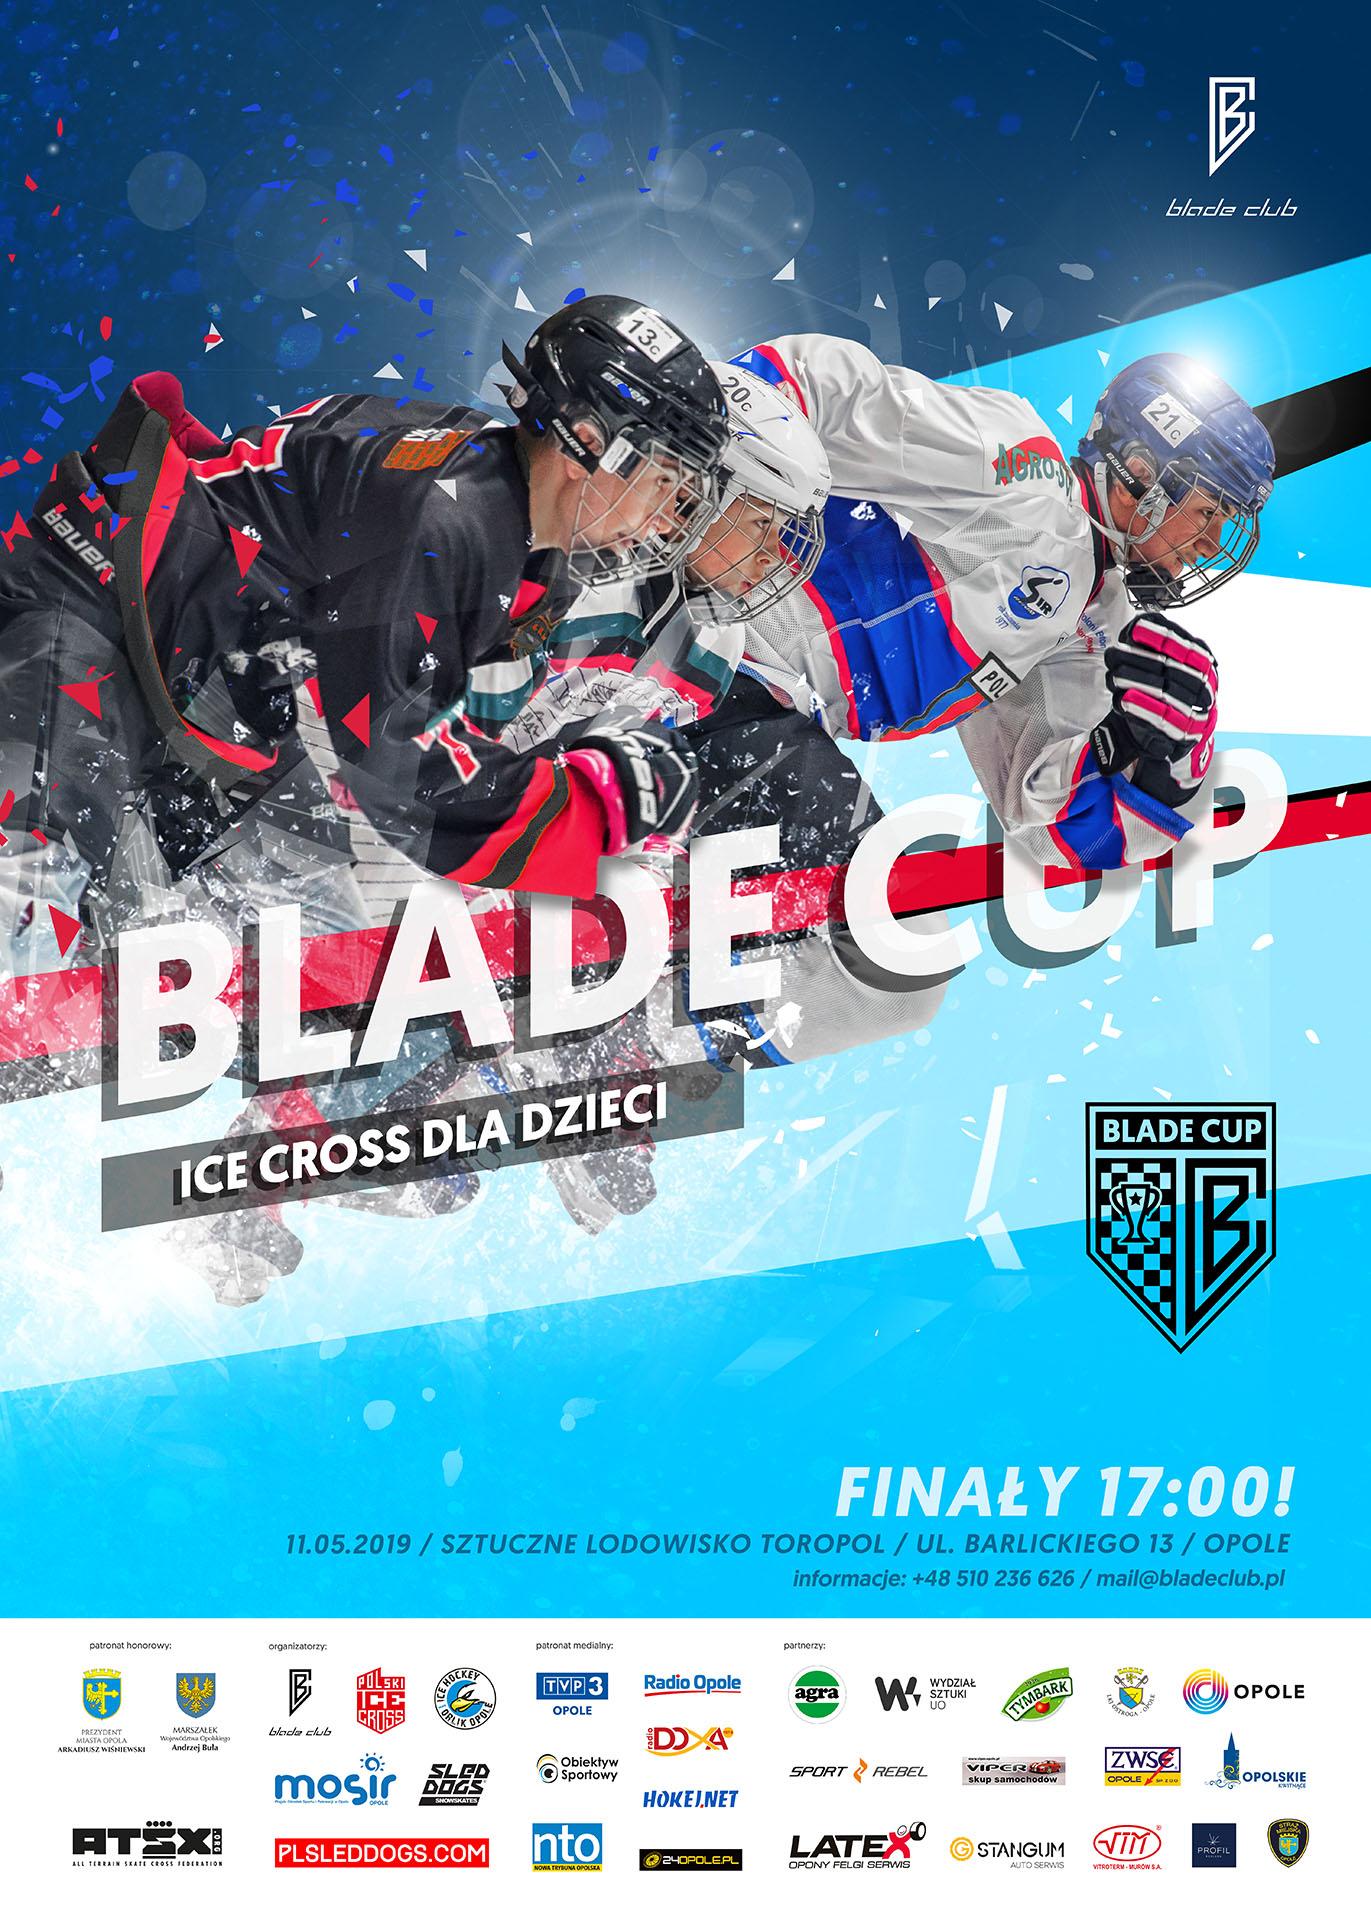 Plakat-icecross-2019-www